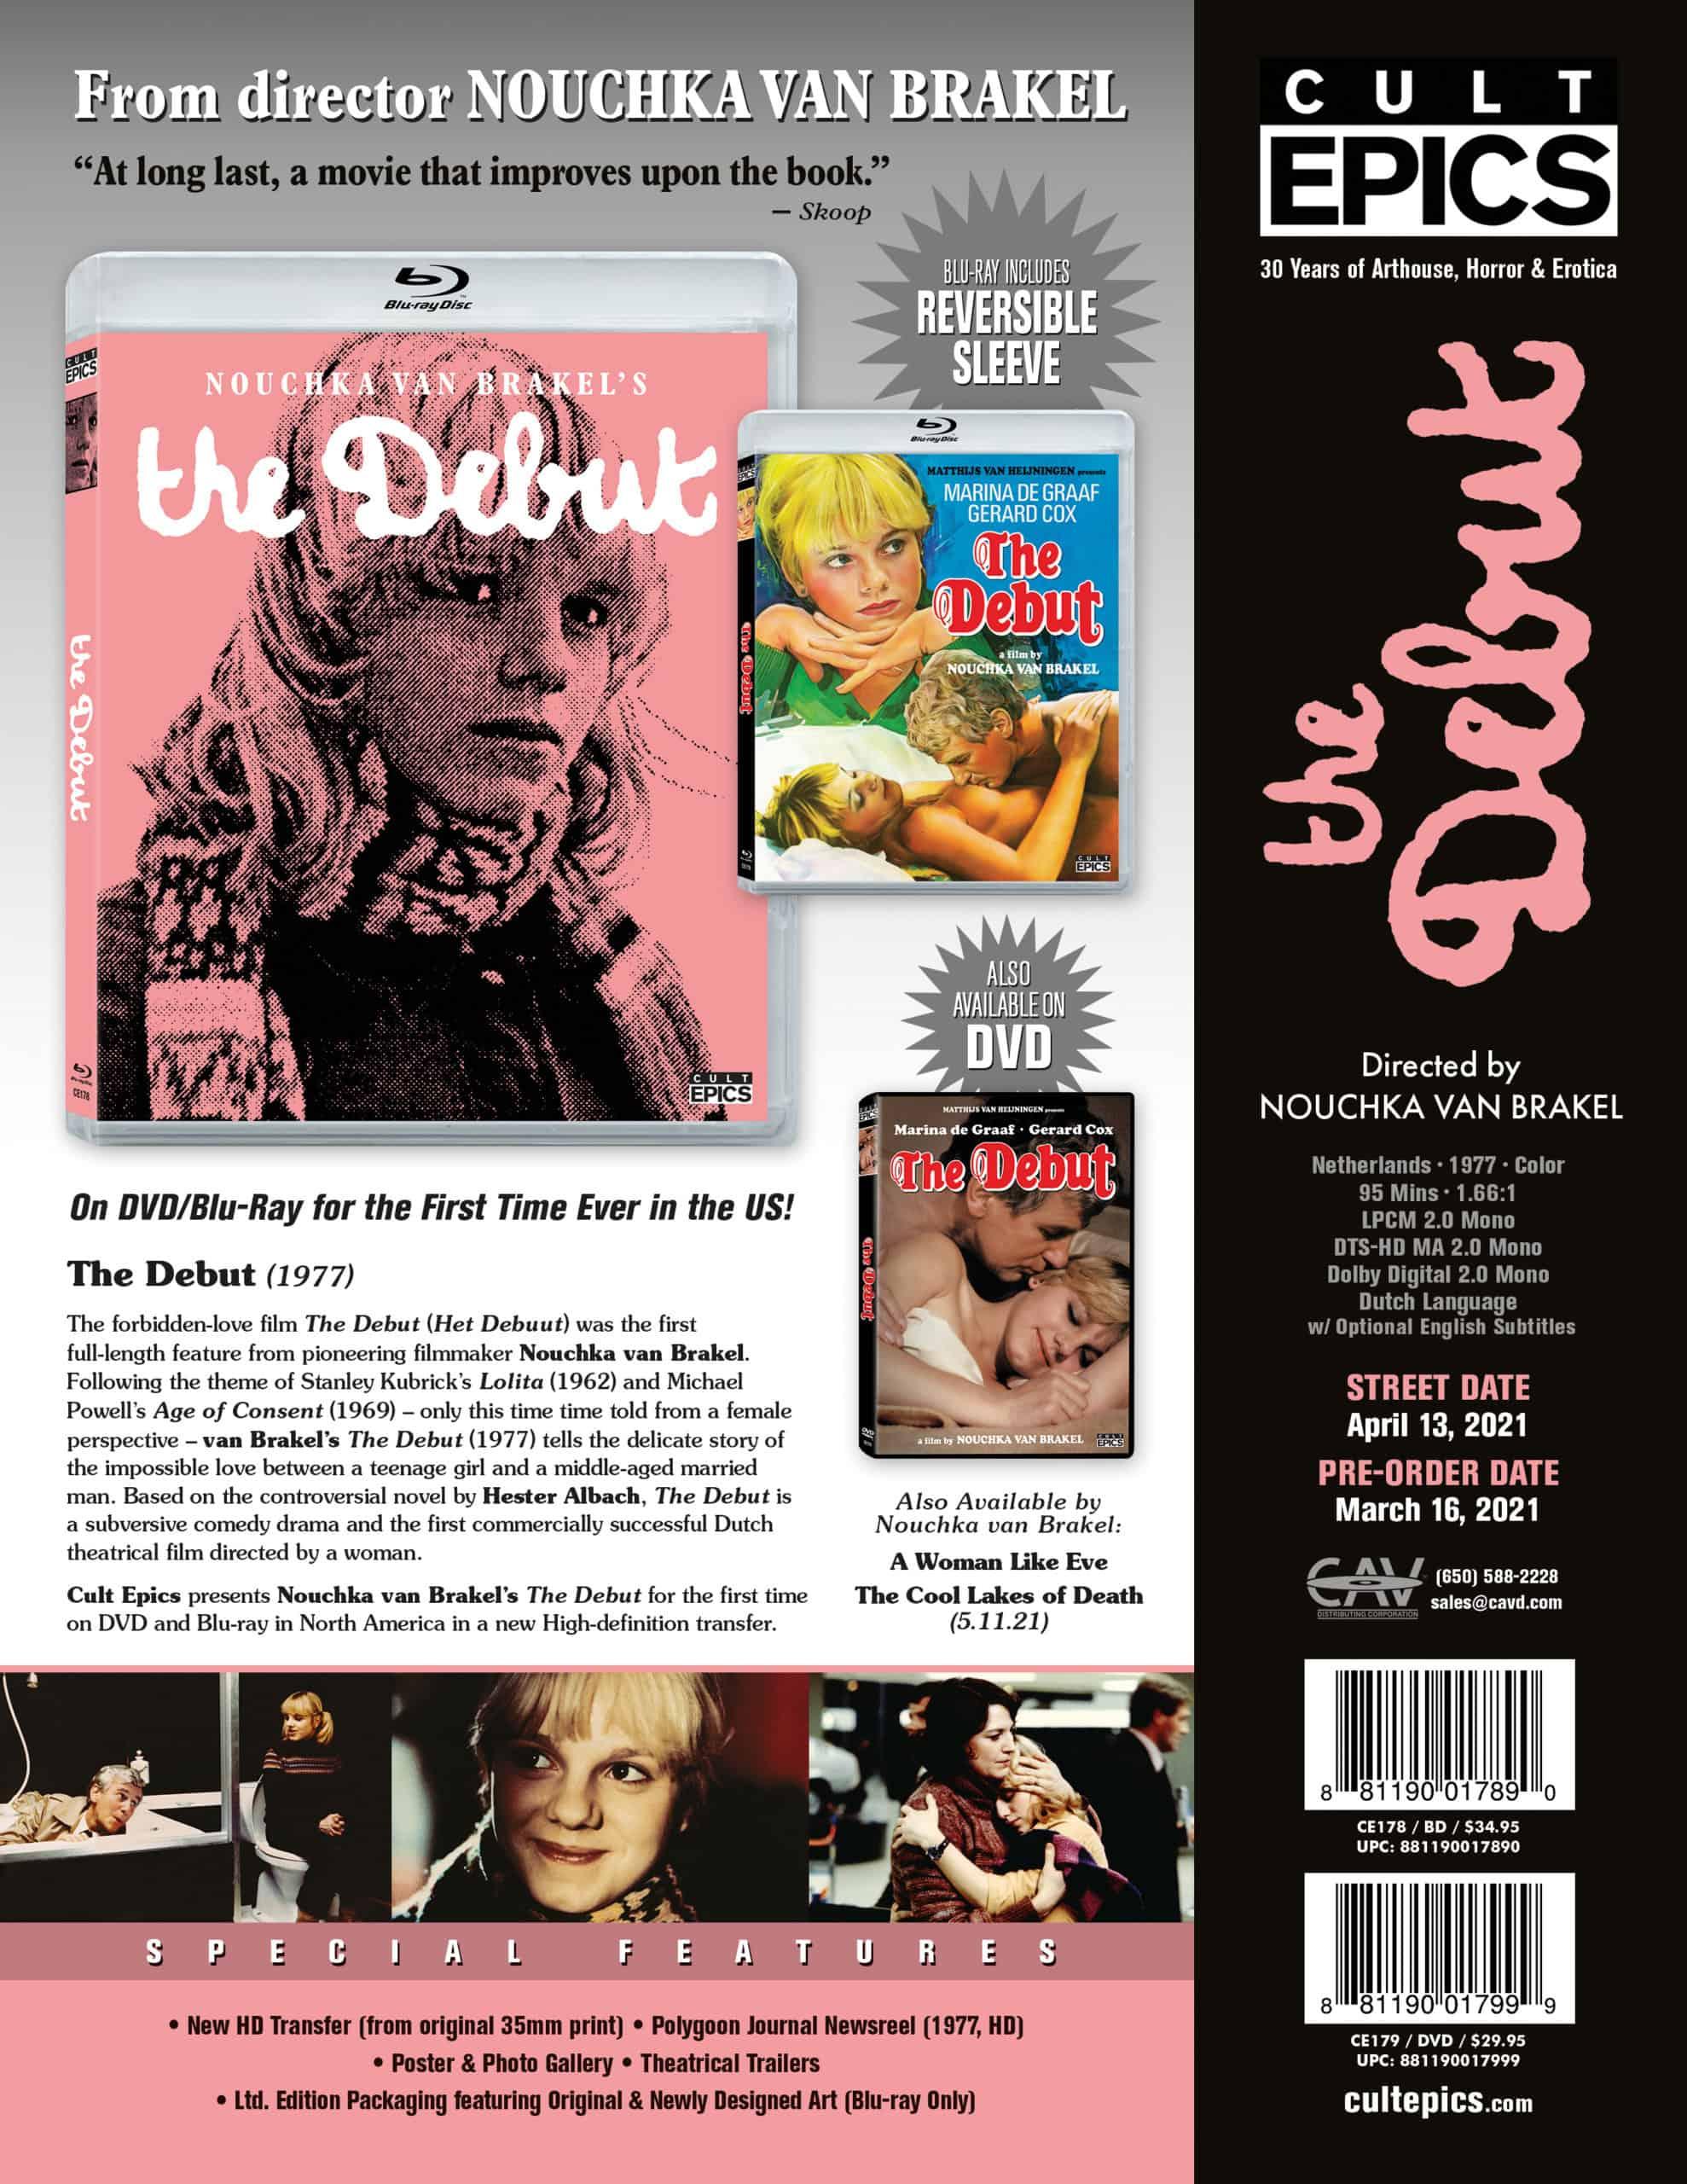 Thursday News: Saturn Awards, Olympia, Paramount, Cult Epics 10